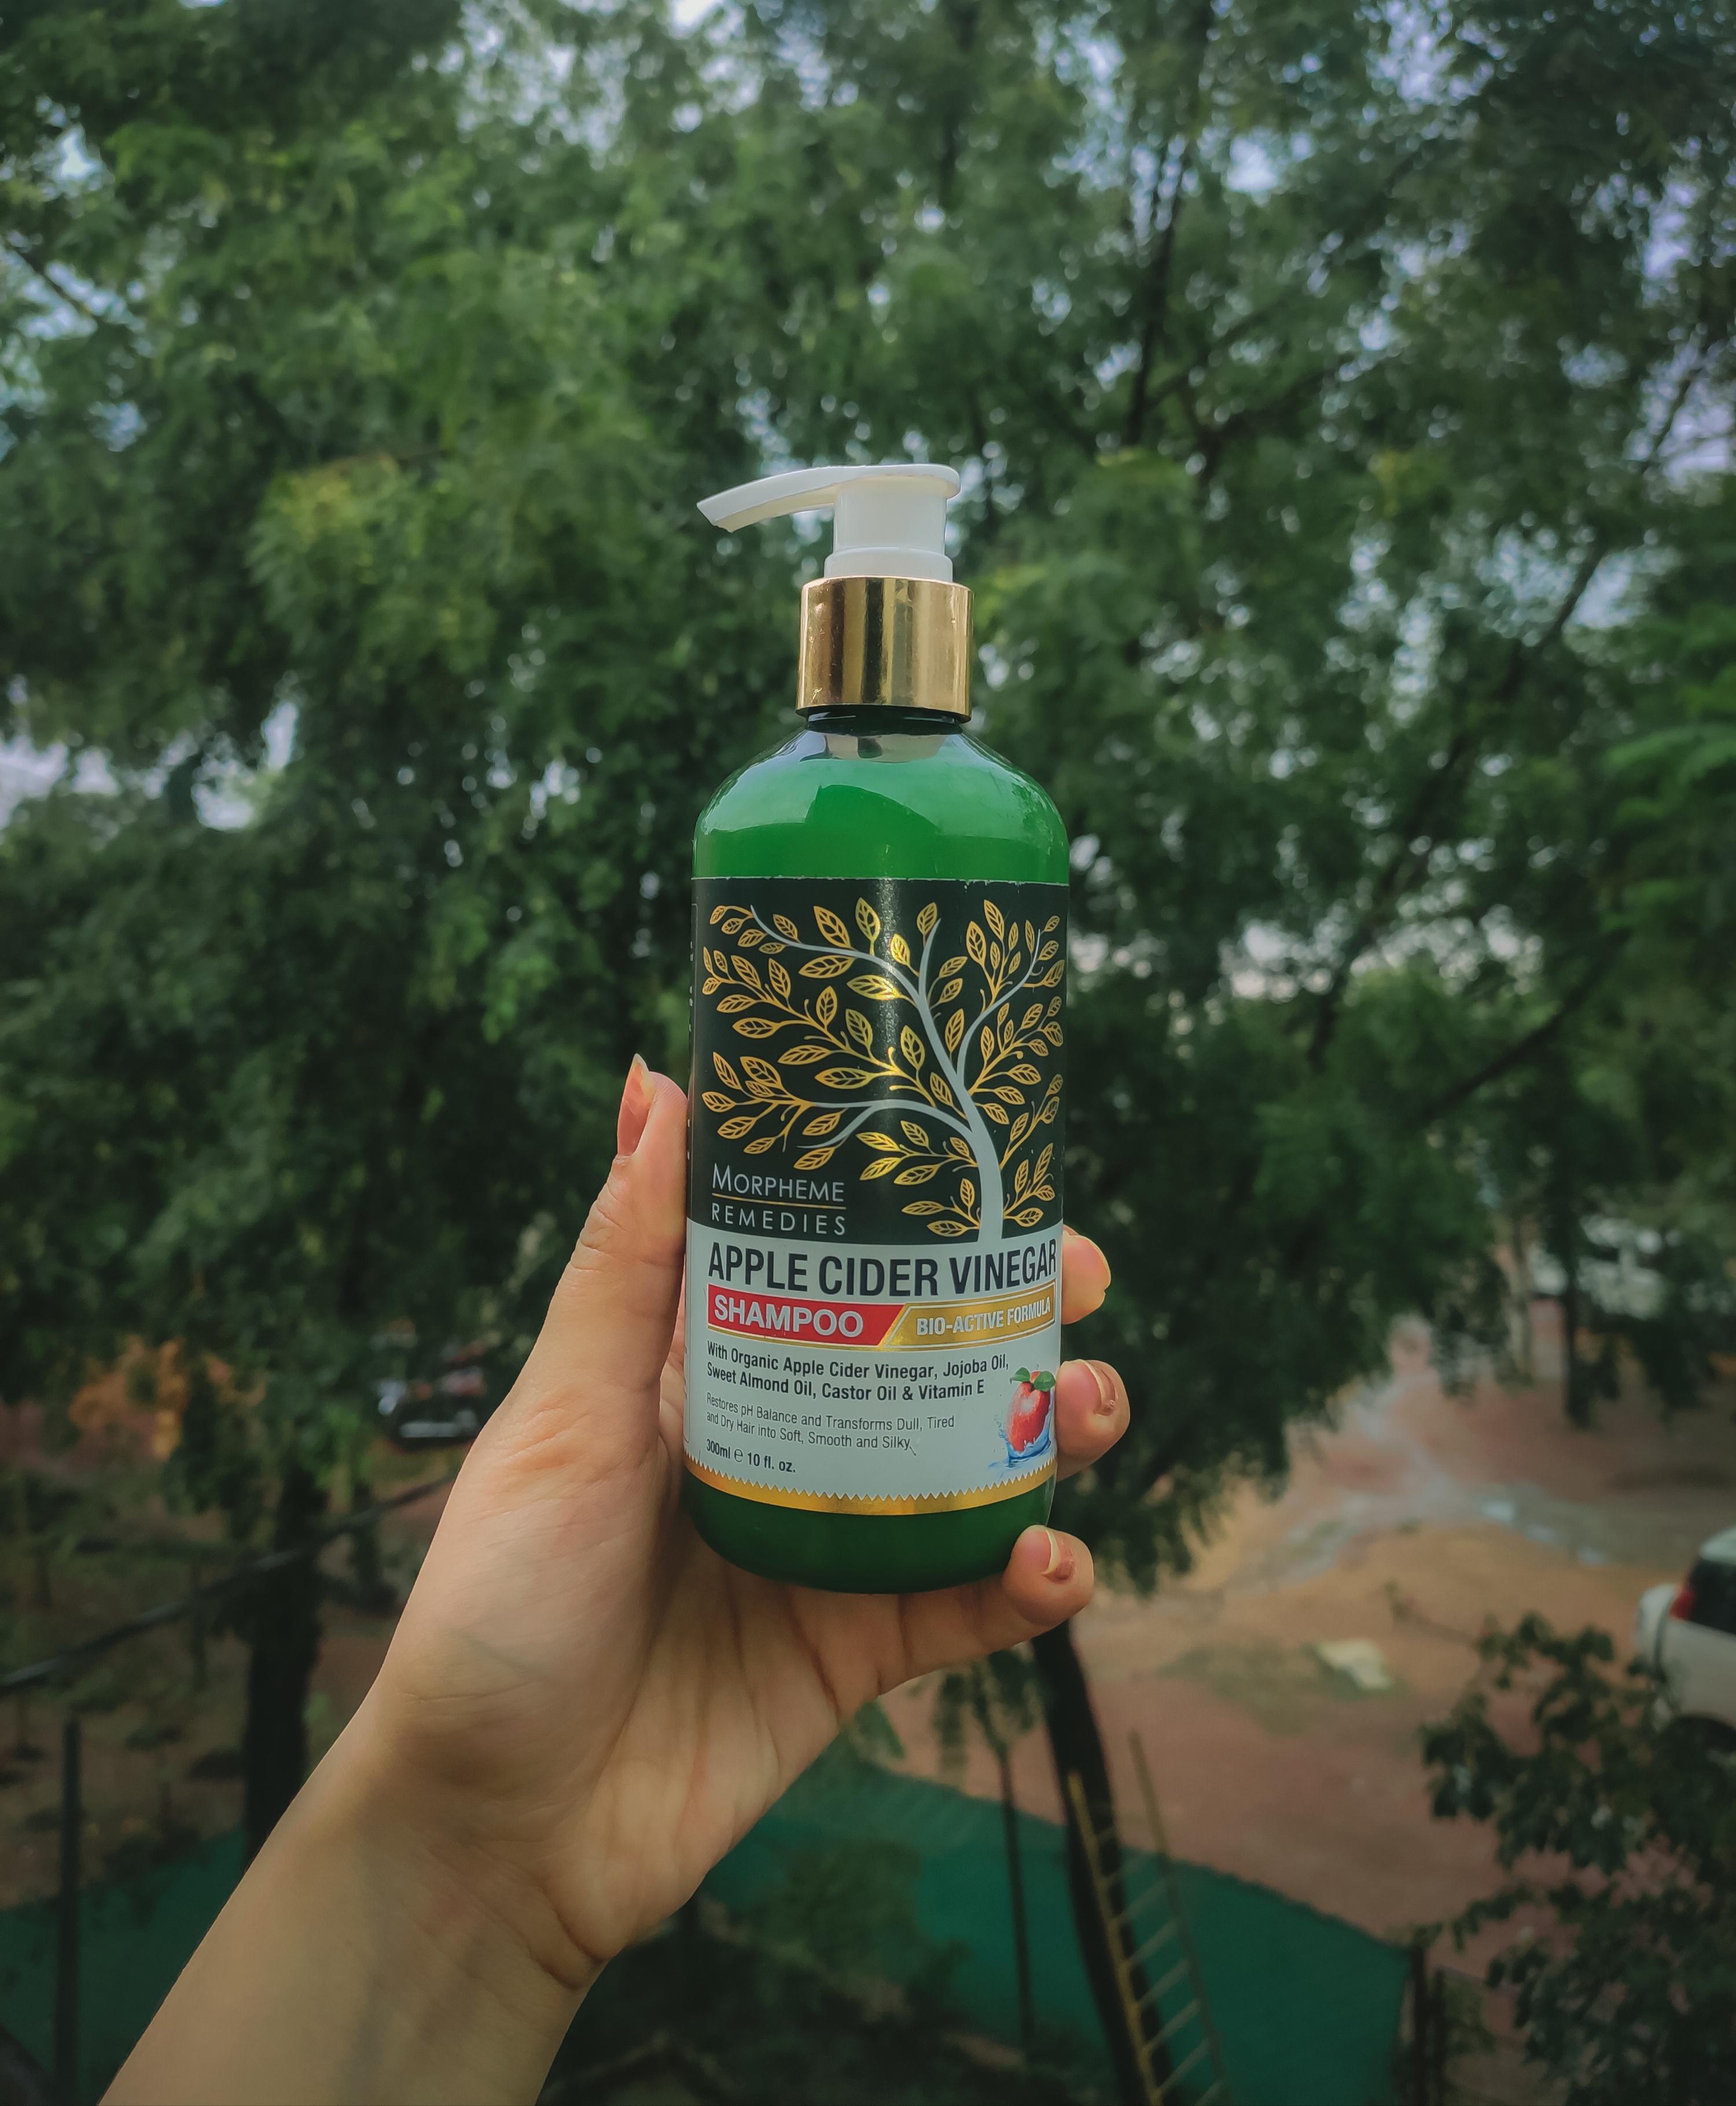 Morpheme Remedies Apple Cider Vinegar Shampoo -Best in organic shampoos-By himanshichoubey